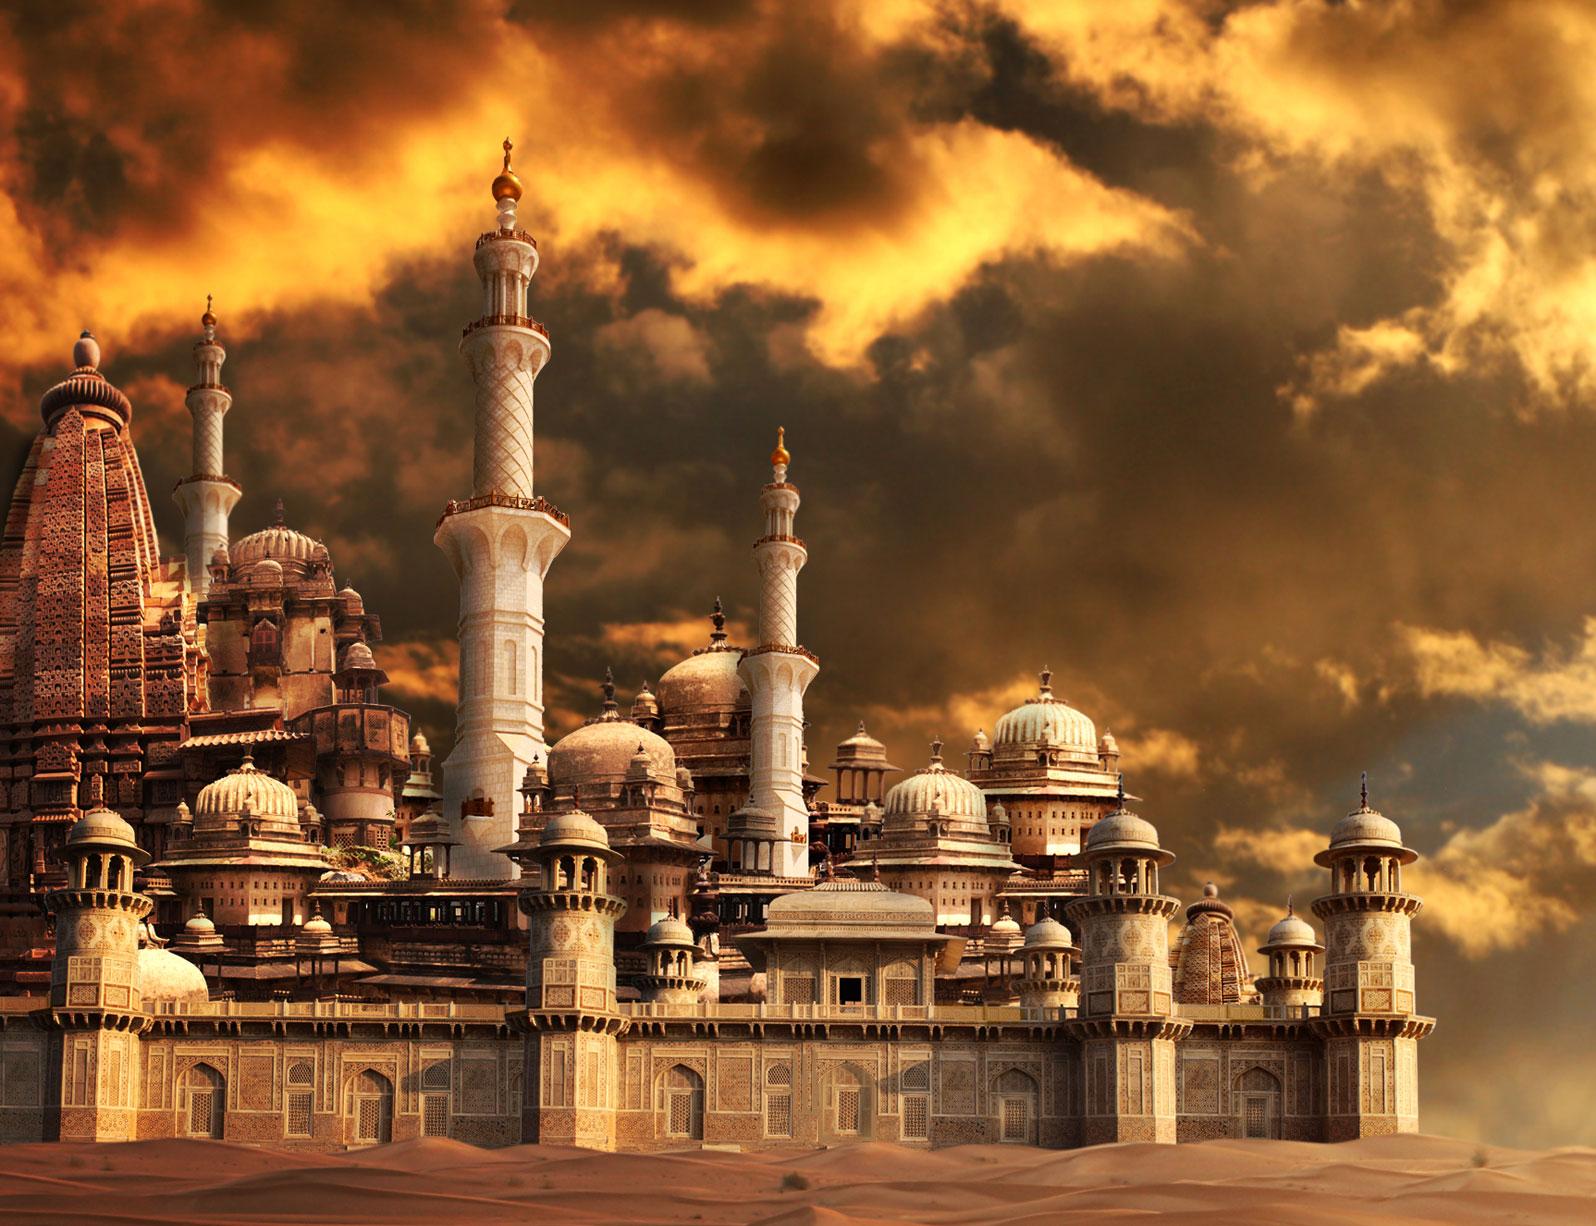 Auraun City